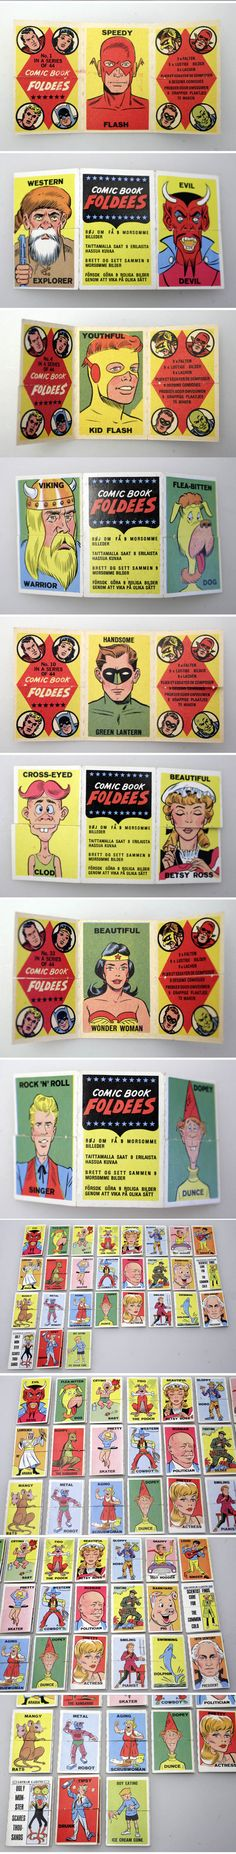 A (Topps) Comic Book Foldees Marvel Comics 1960's  EBAY ONLINE AUCTION NOW ON SALE START EURO 99.00.-:  http://www.ebay.de/itm/130876233951?ssPageName=STRK:MESELX:IT&_trksid=p3984.m1558.l2649